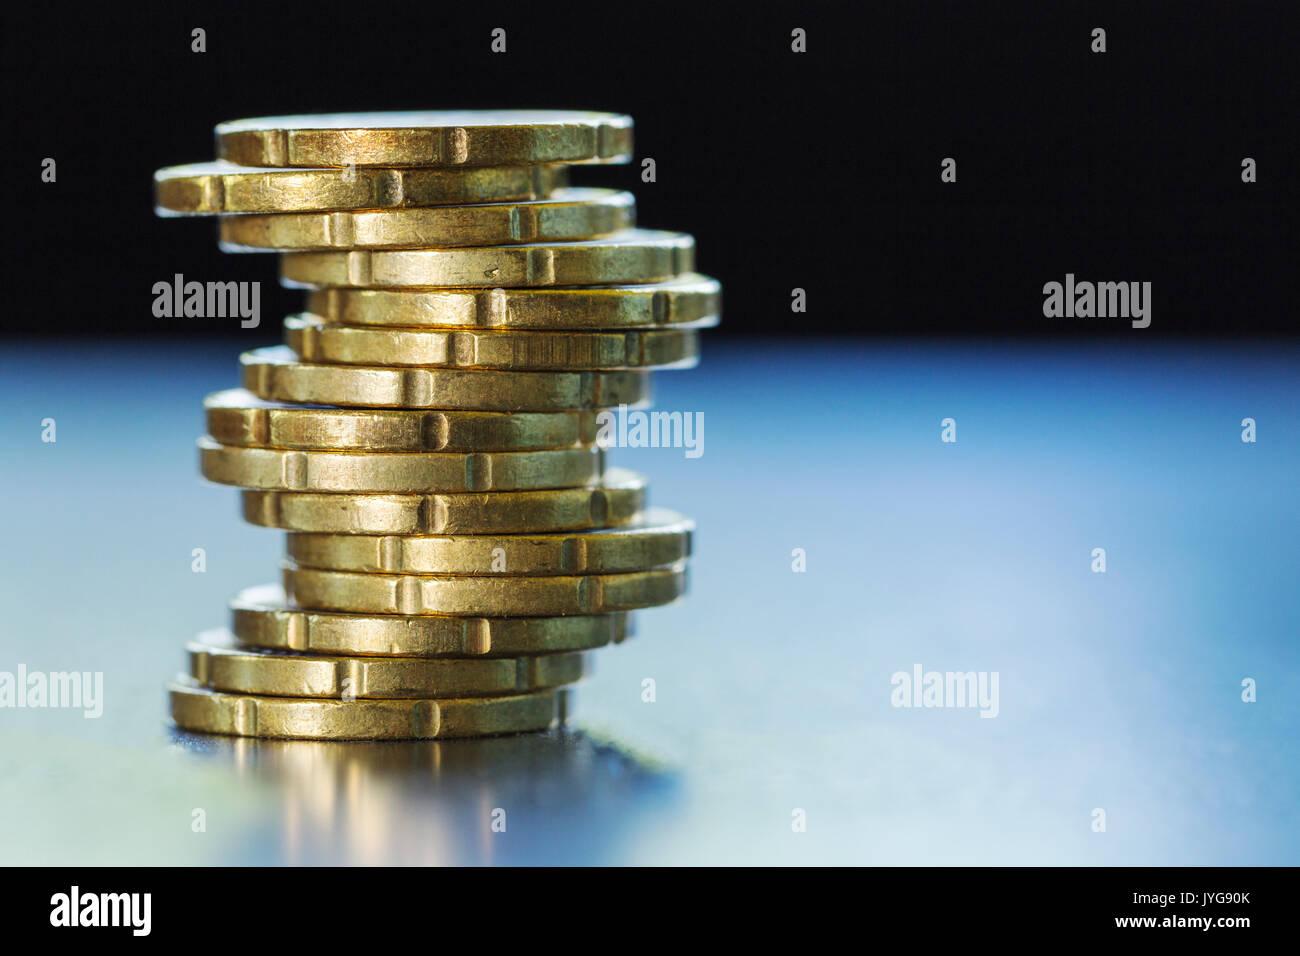 Gold Glänzend 20 Euro Cent Münzen Stockfoto Bild 154636963 Alamy